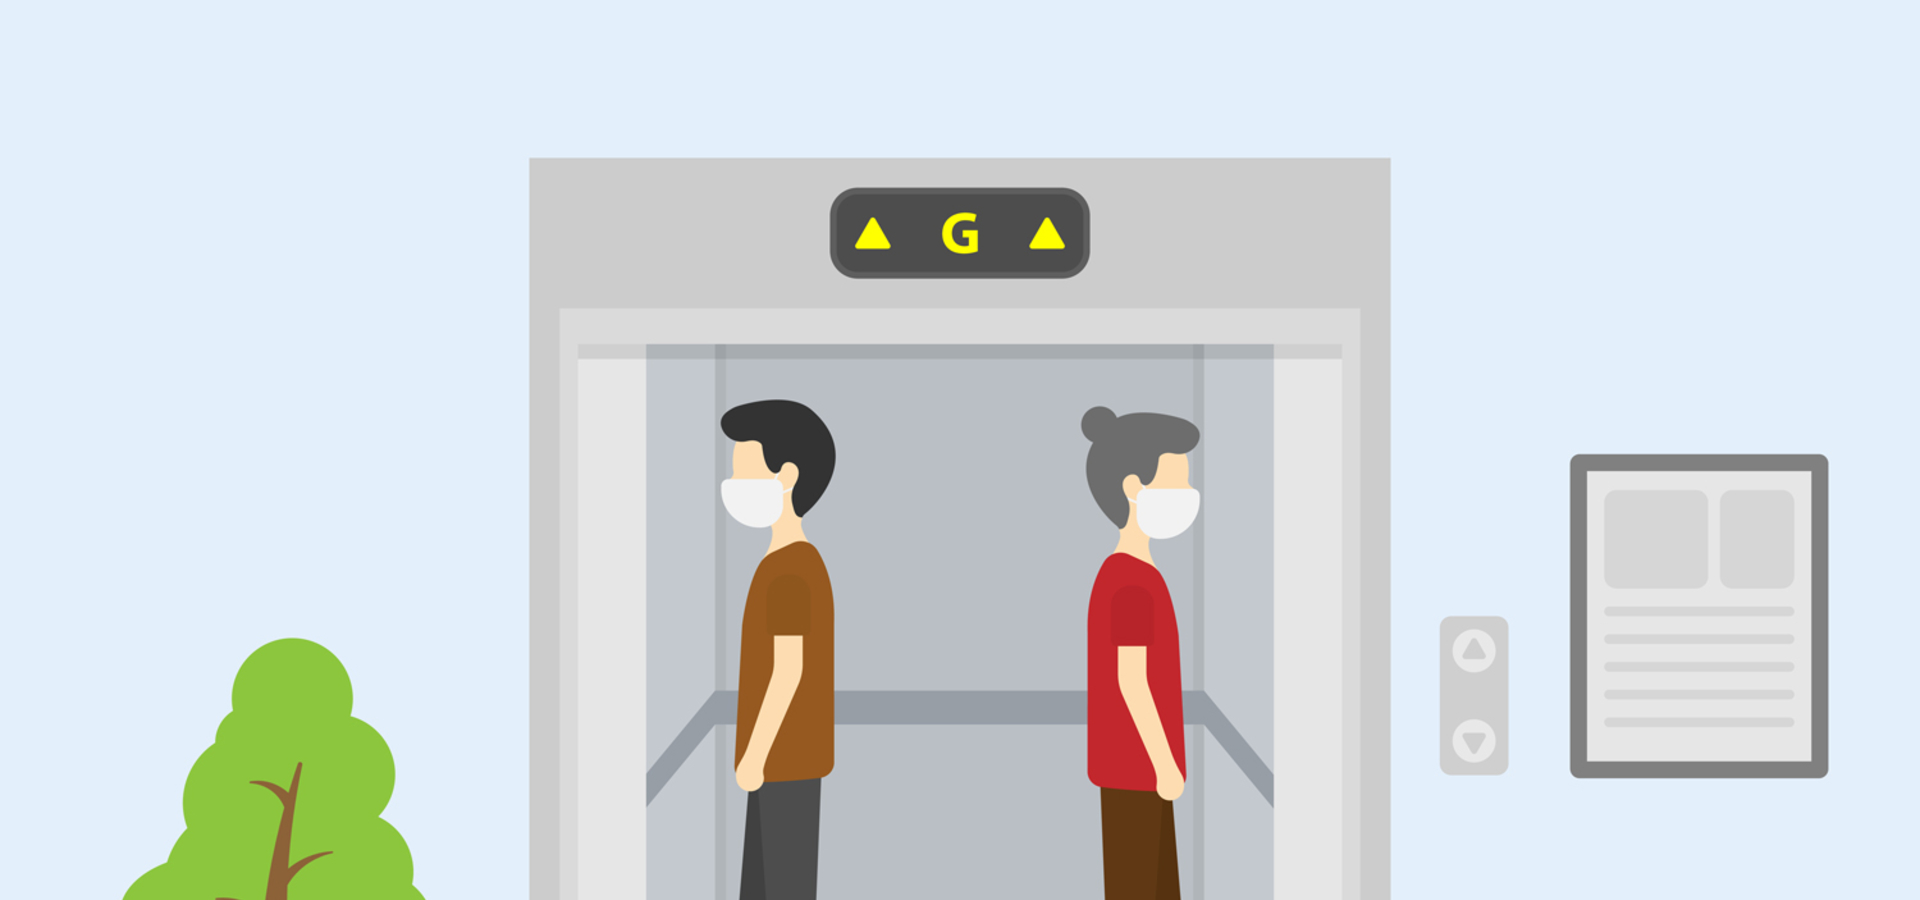 Avoid using hotel elevators, warns medical study